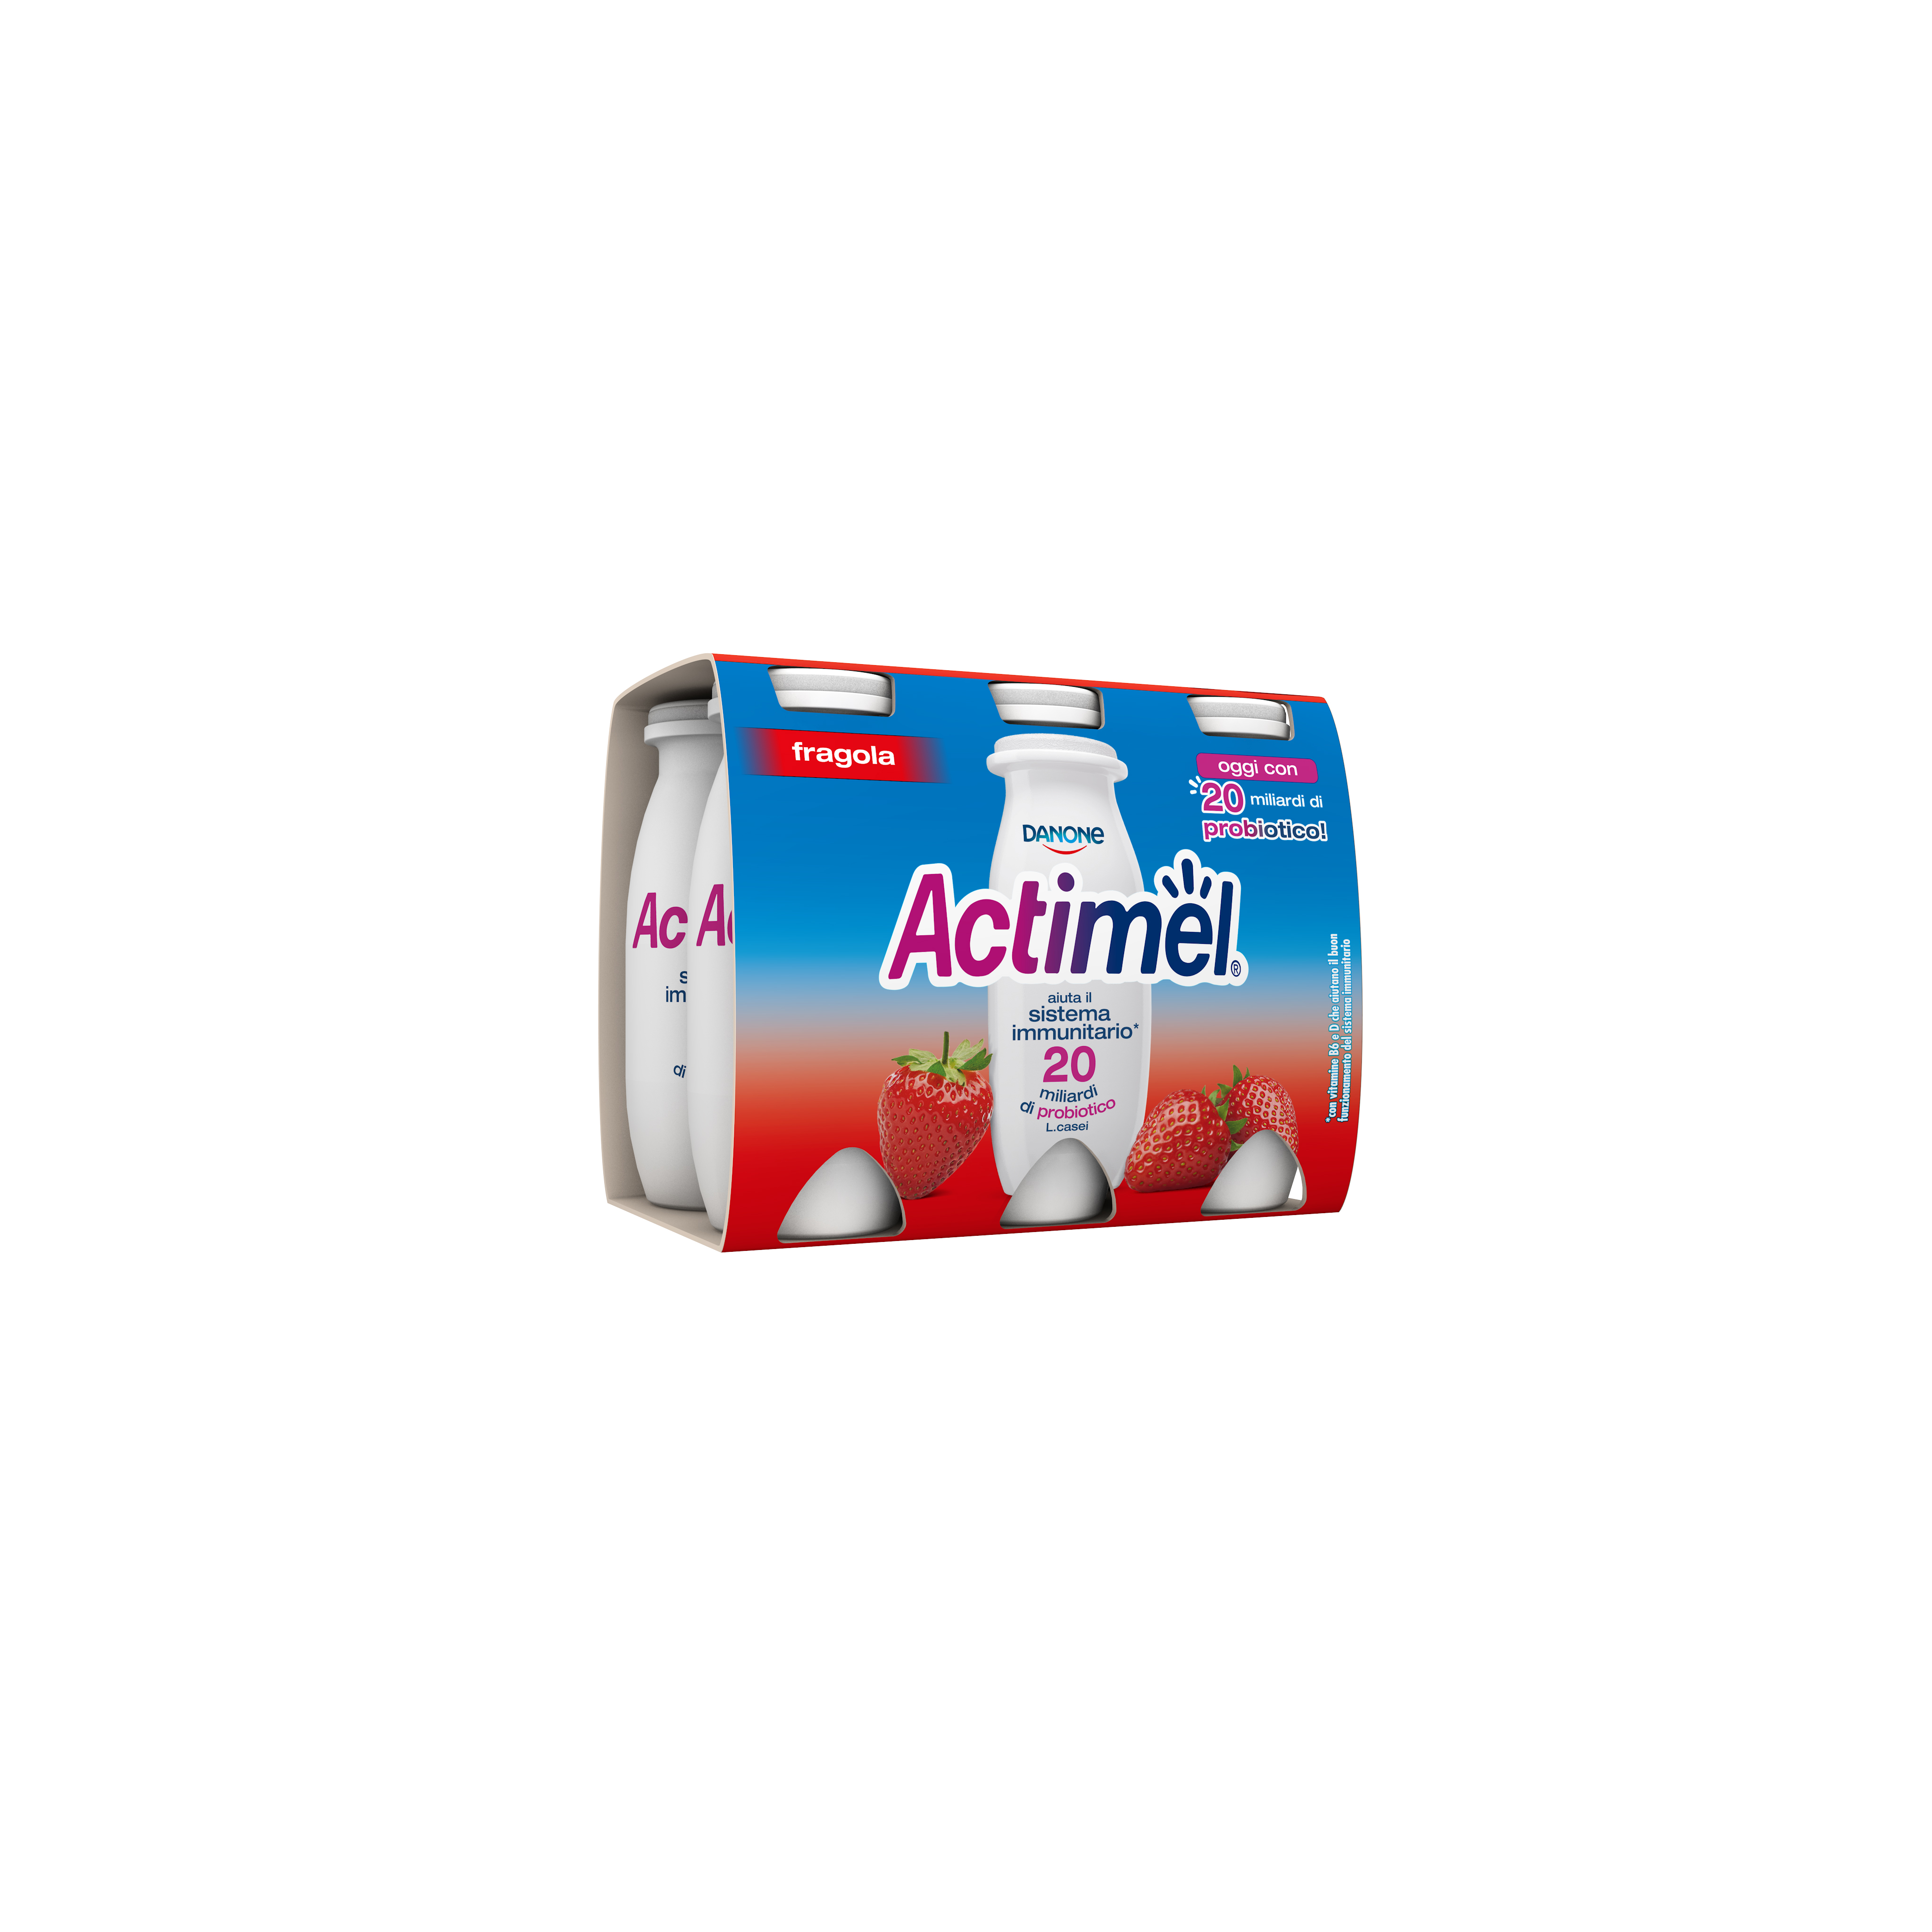 ACTIMEL DANONE 100GX6 FRAGOLA